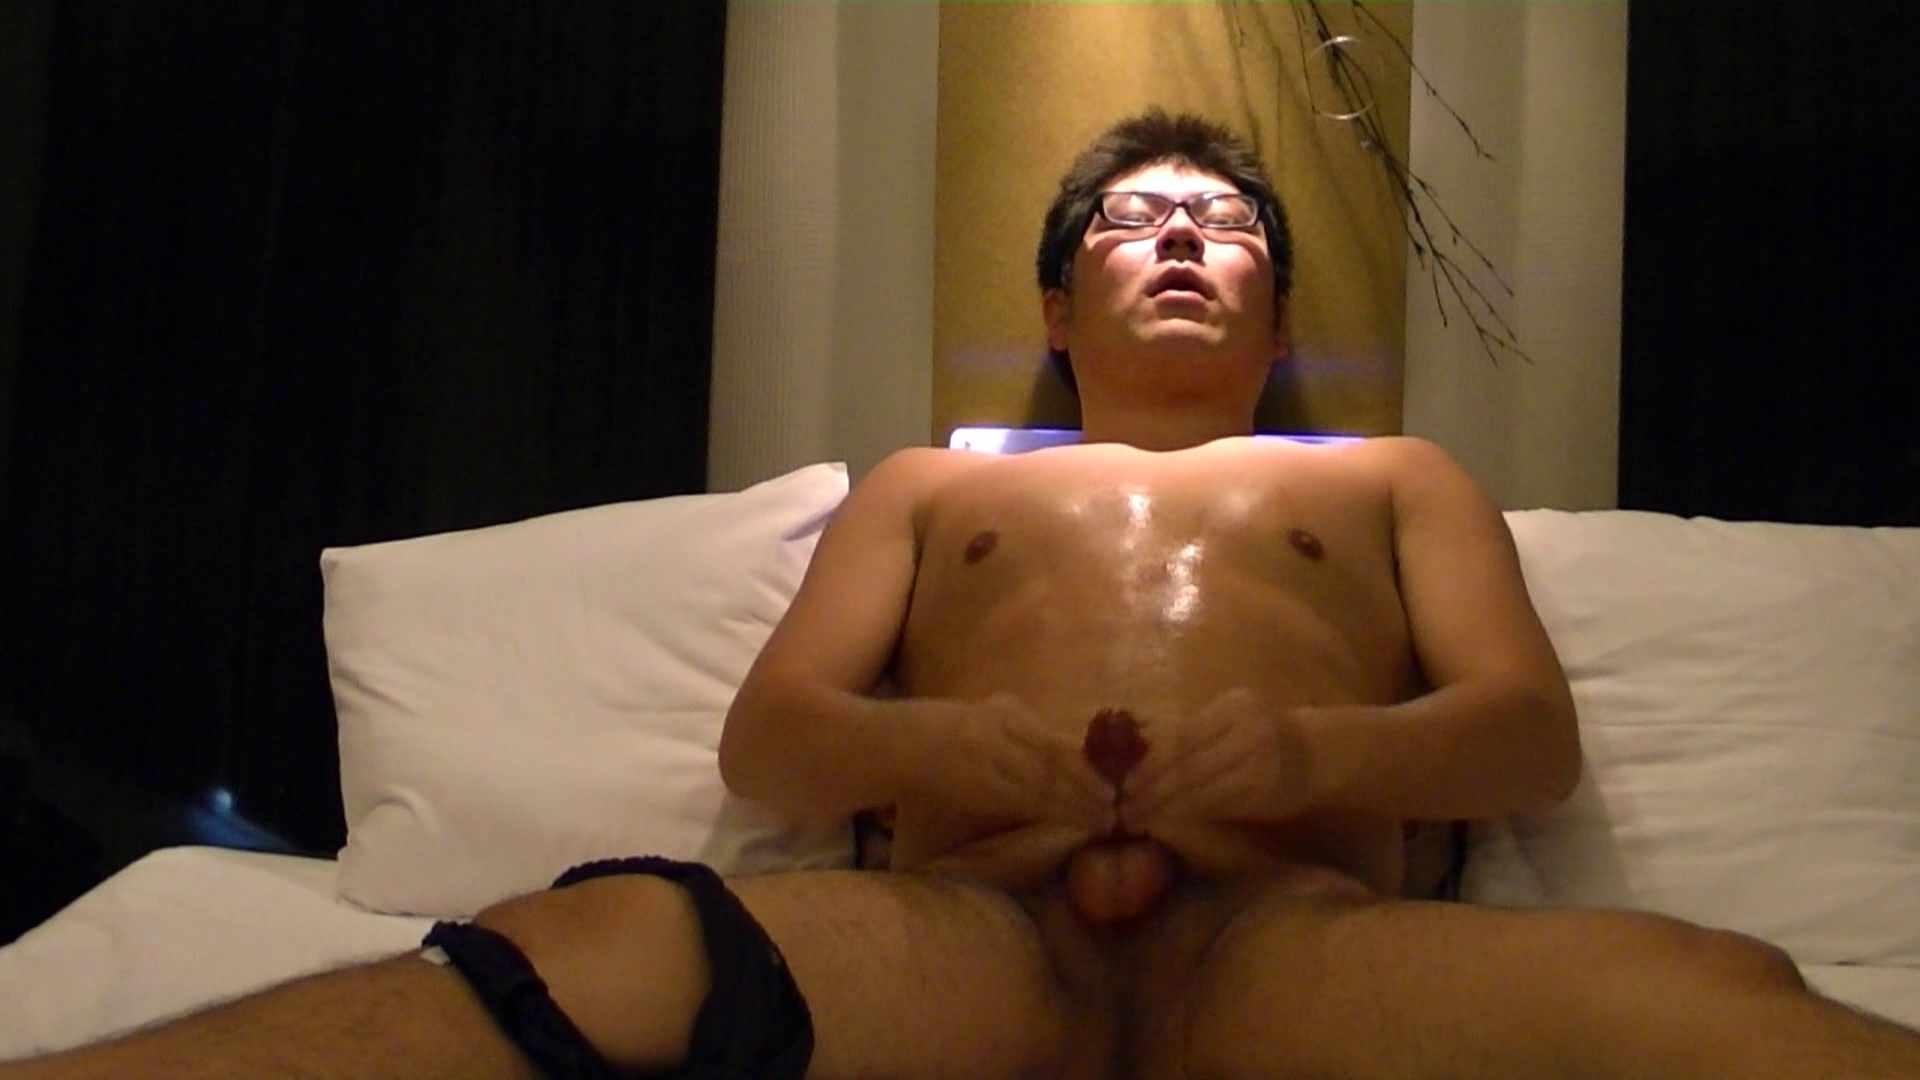 Mr.オナックスさん投稿!HD 貴方のオナニー三万円で撮影させてください。VOL.02 前編 0 | オナニー特集  72pic 11